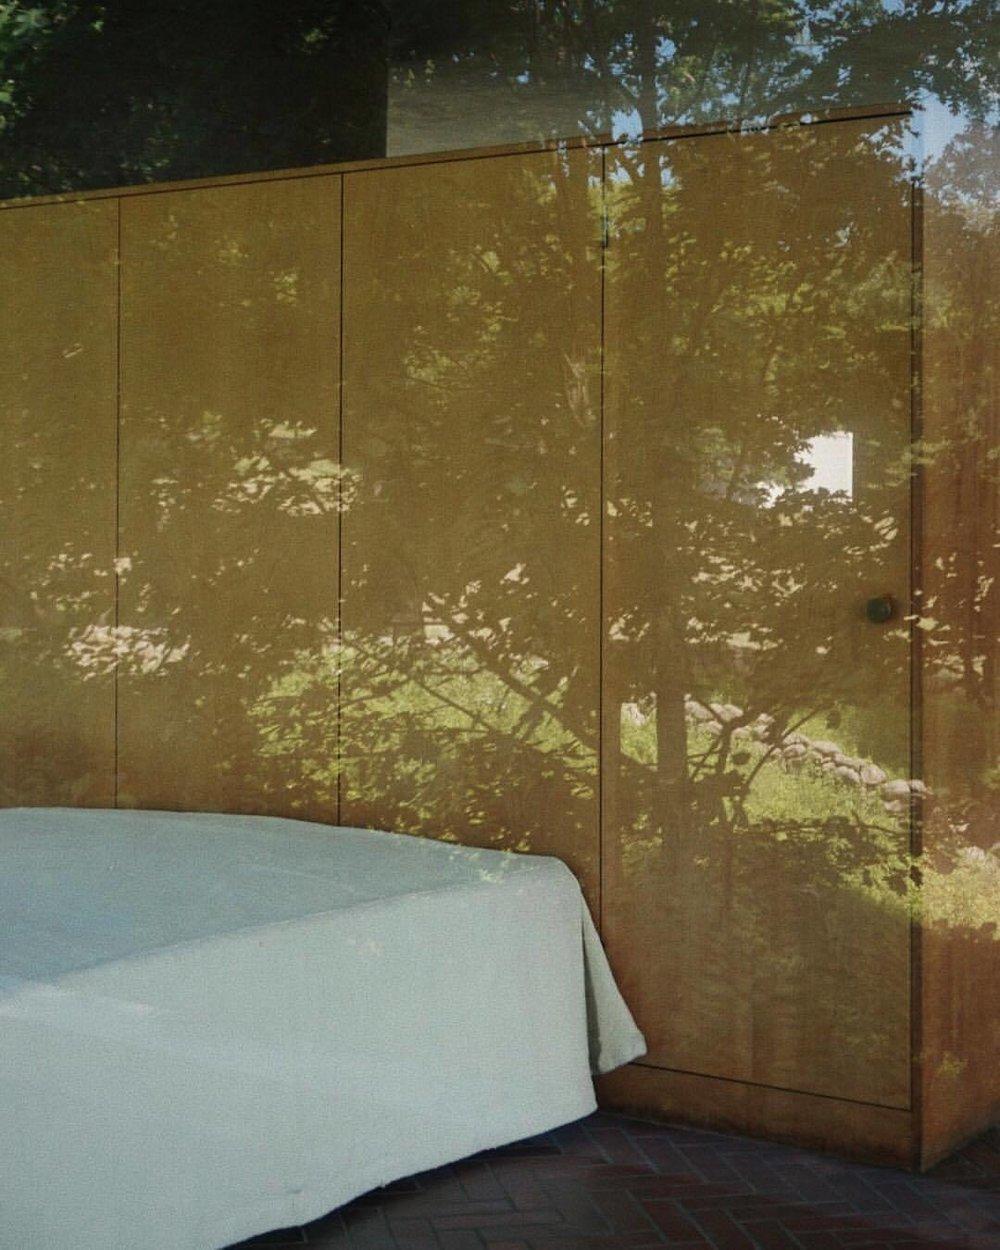 stylishgambino :   #StudyHall Chapter 9, on StylishGambino.com featuring the Philip Johnson Glass House. (at The Philip Johnson Glass House)